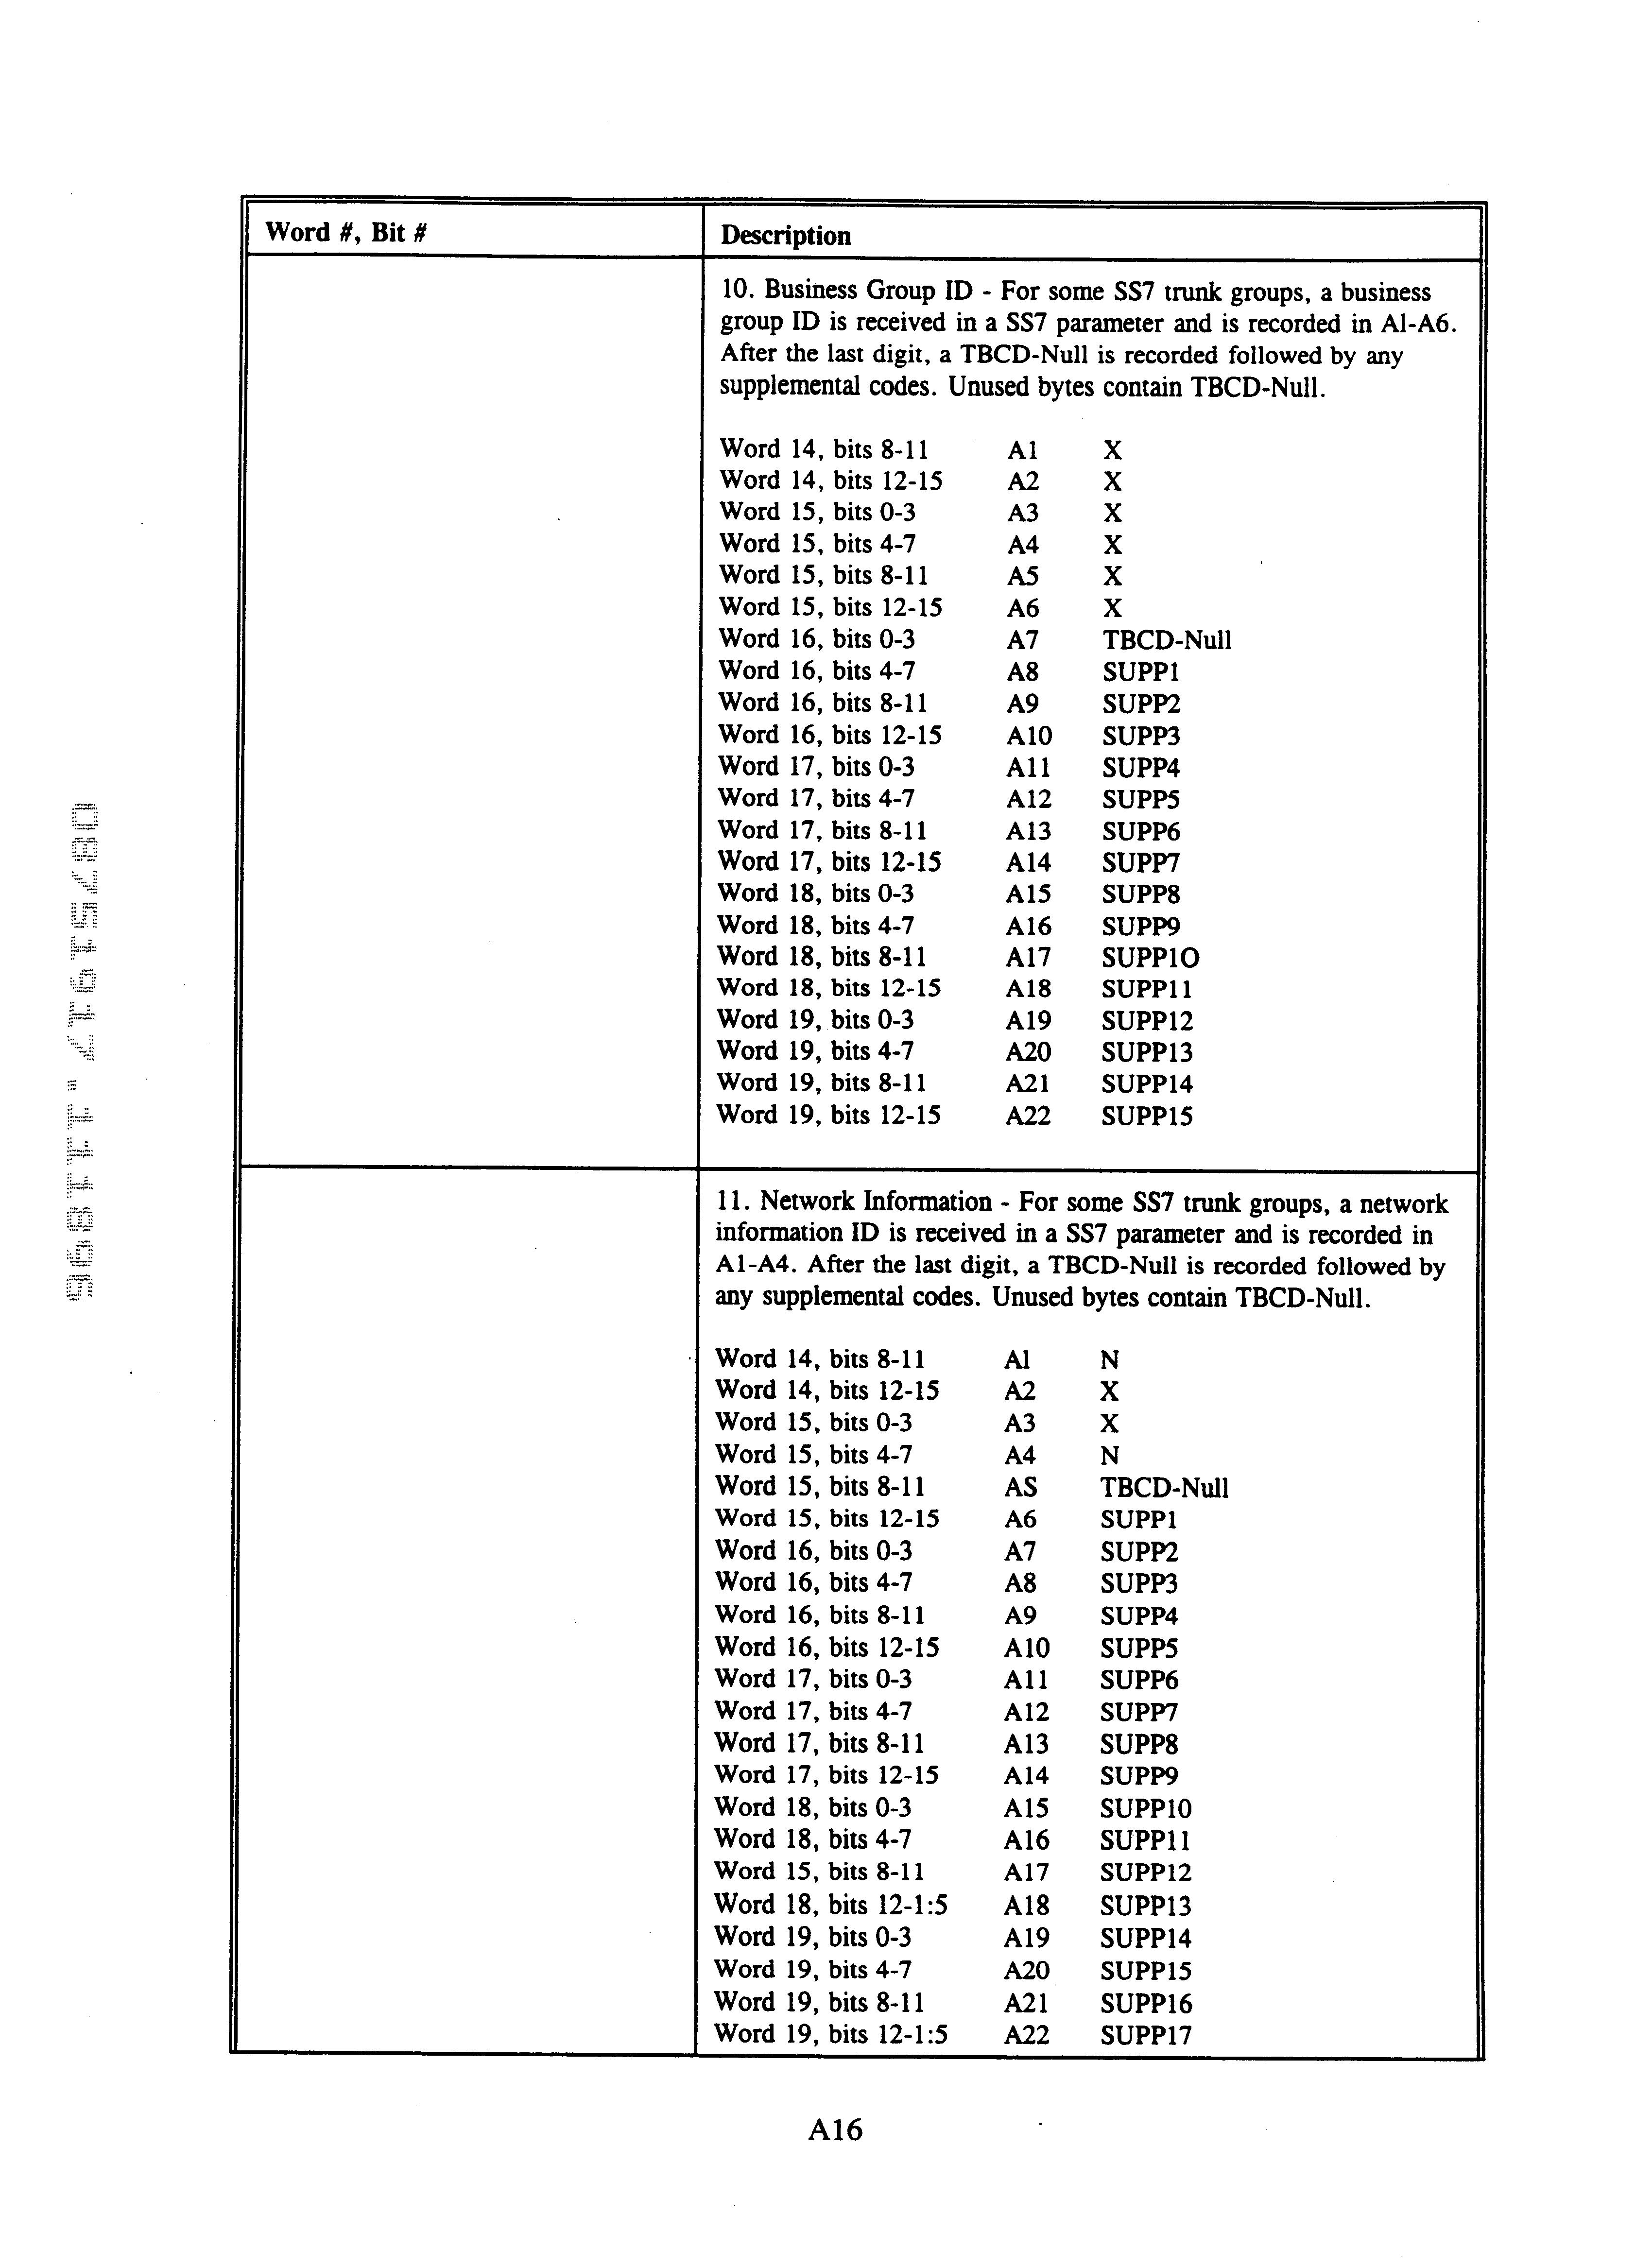 Patent US 6,335,927 B1